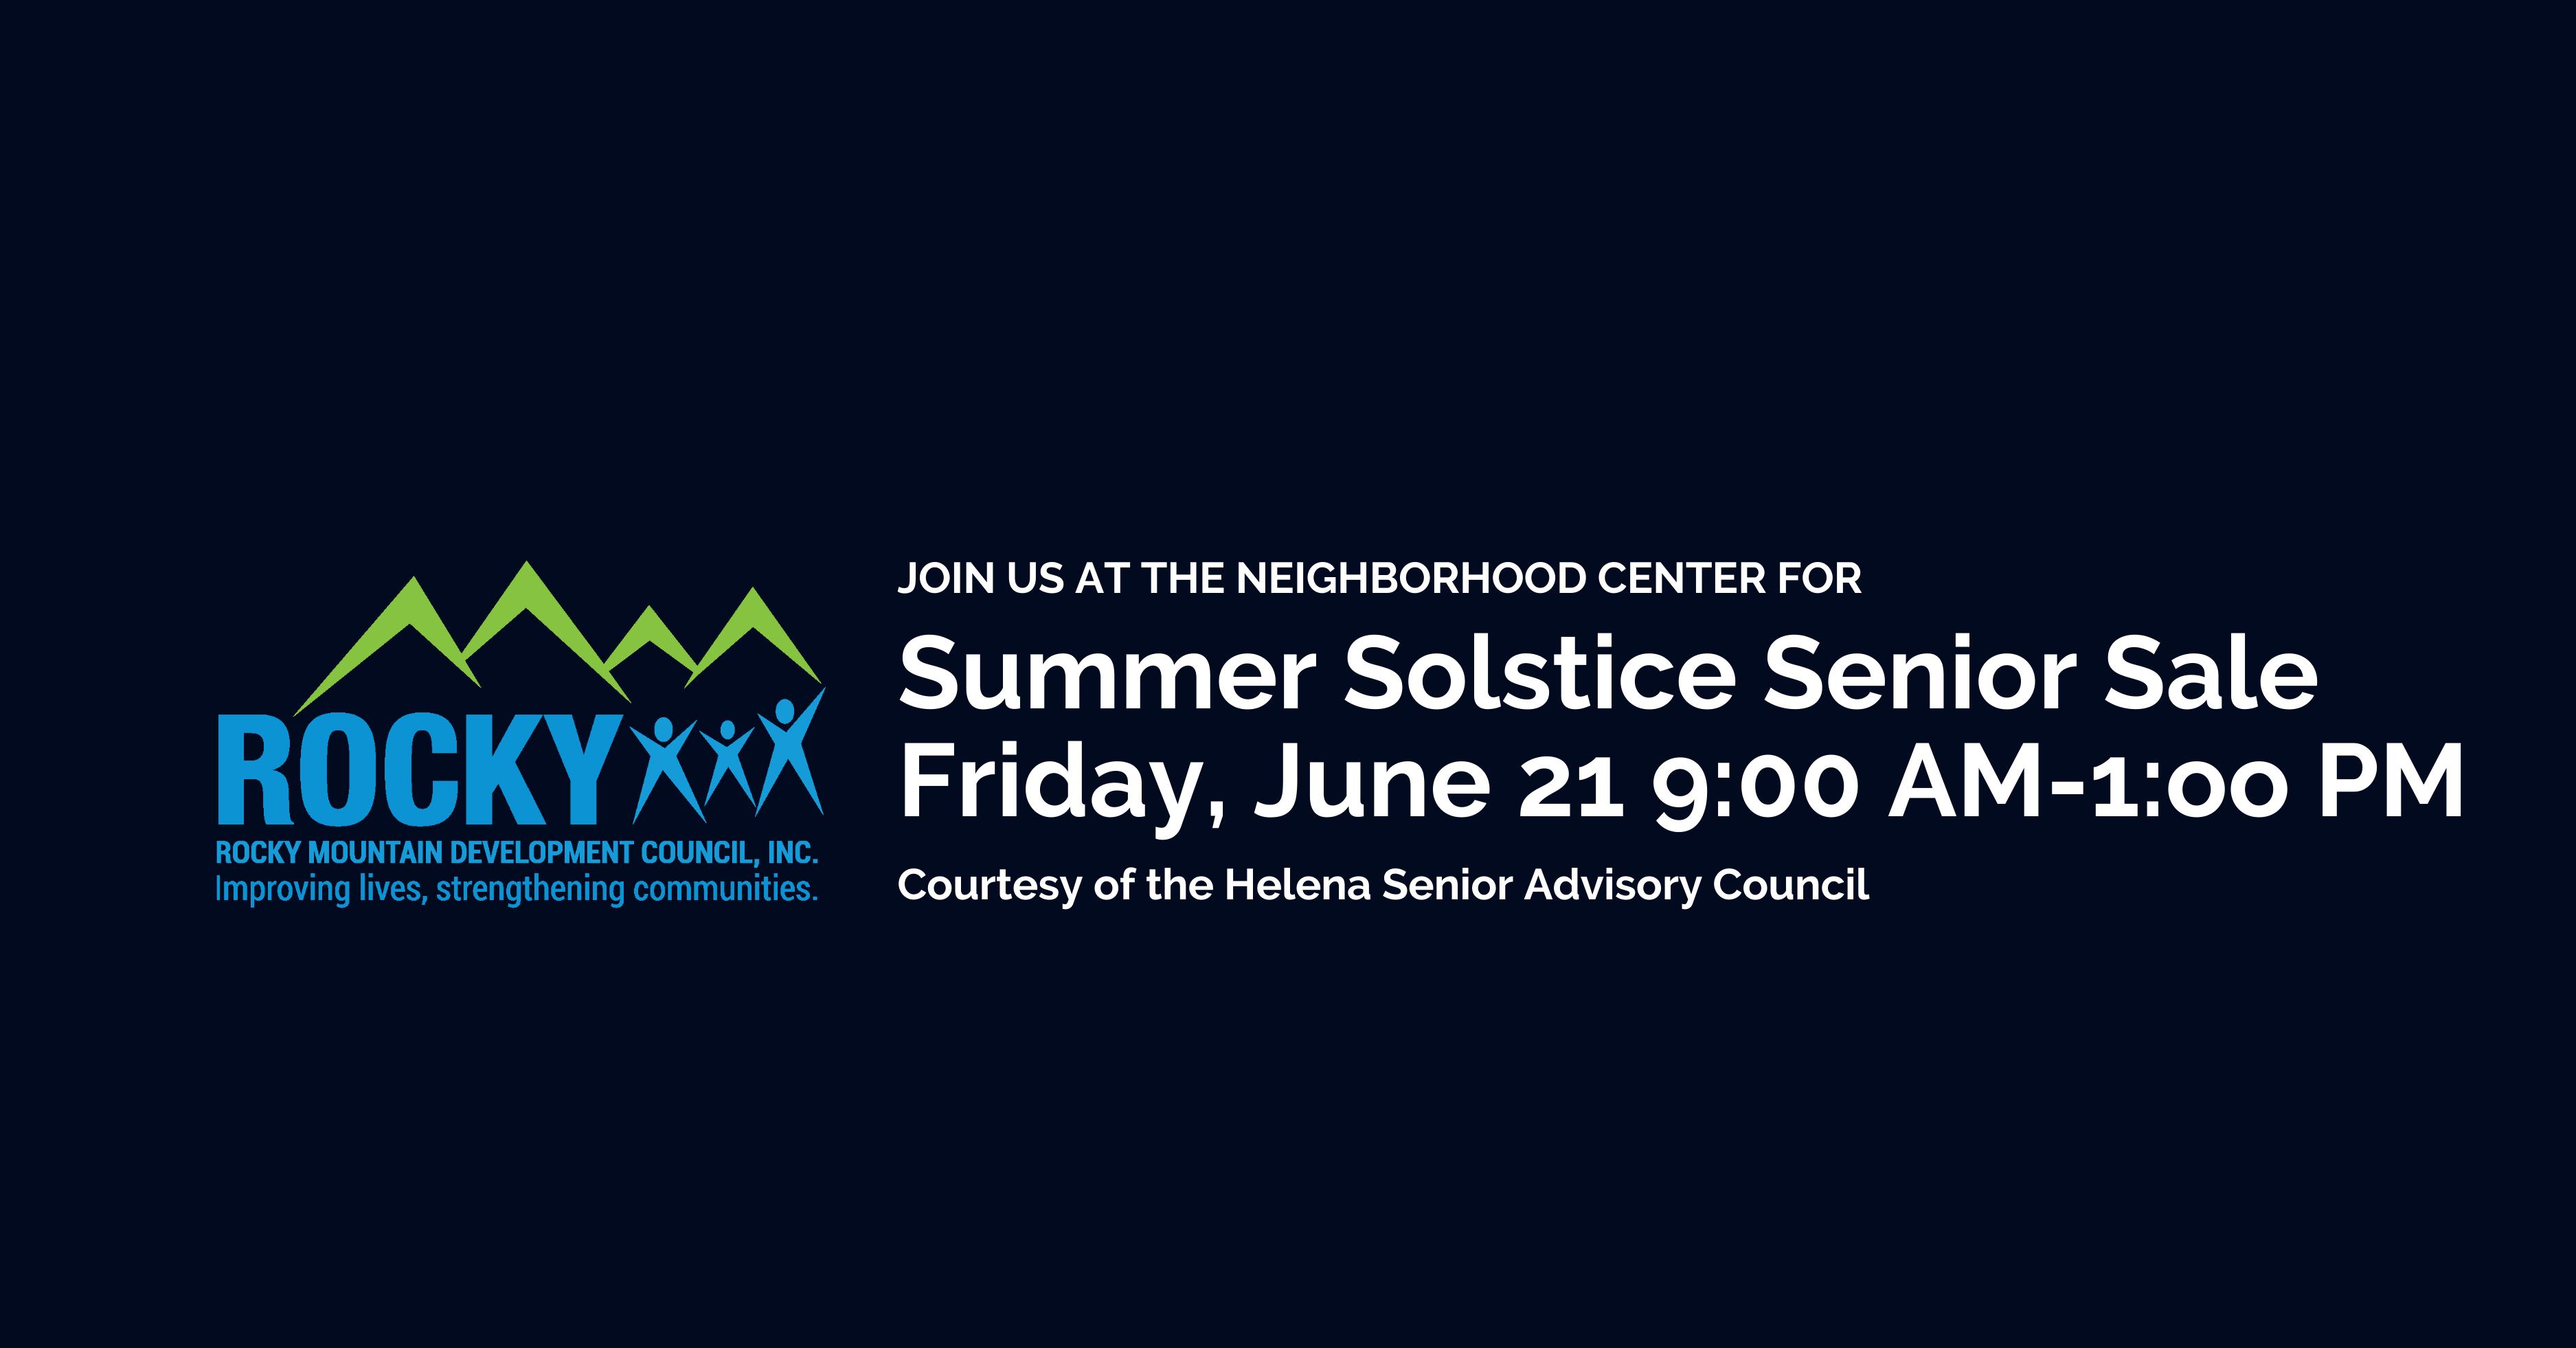 Summer Solstice Senior Sale